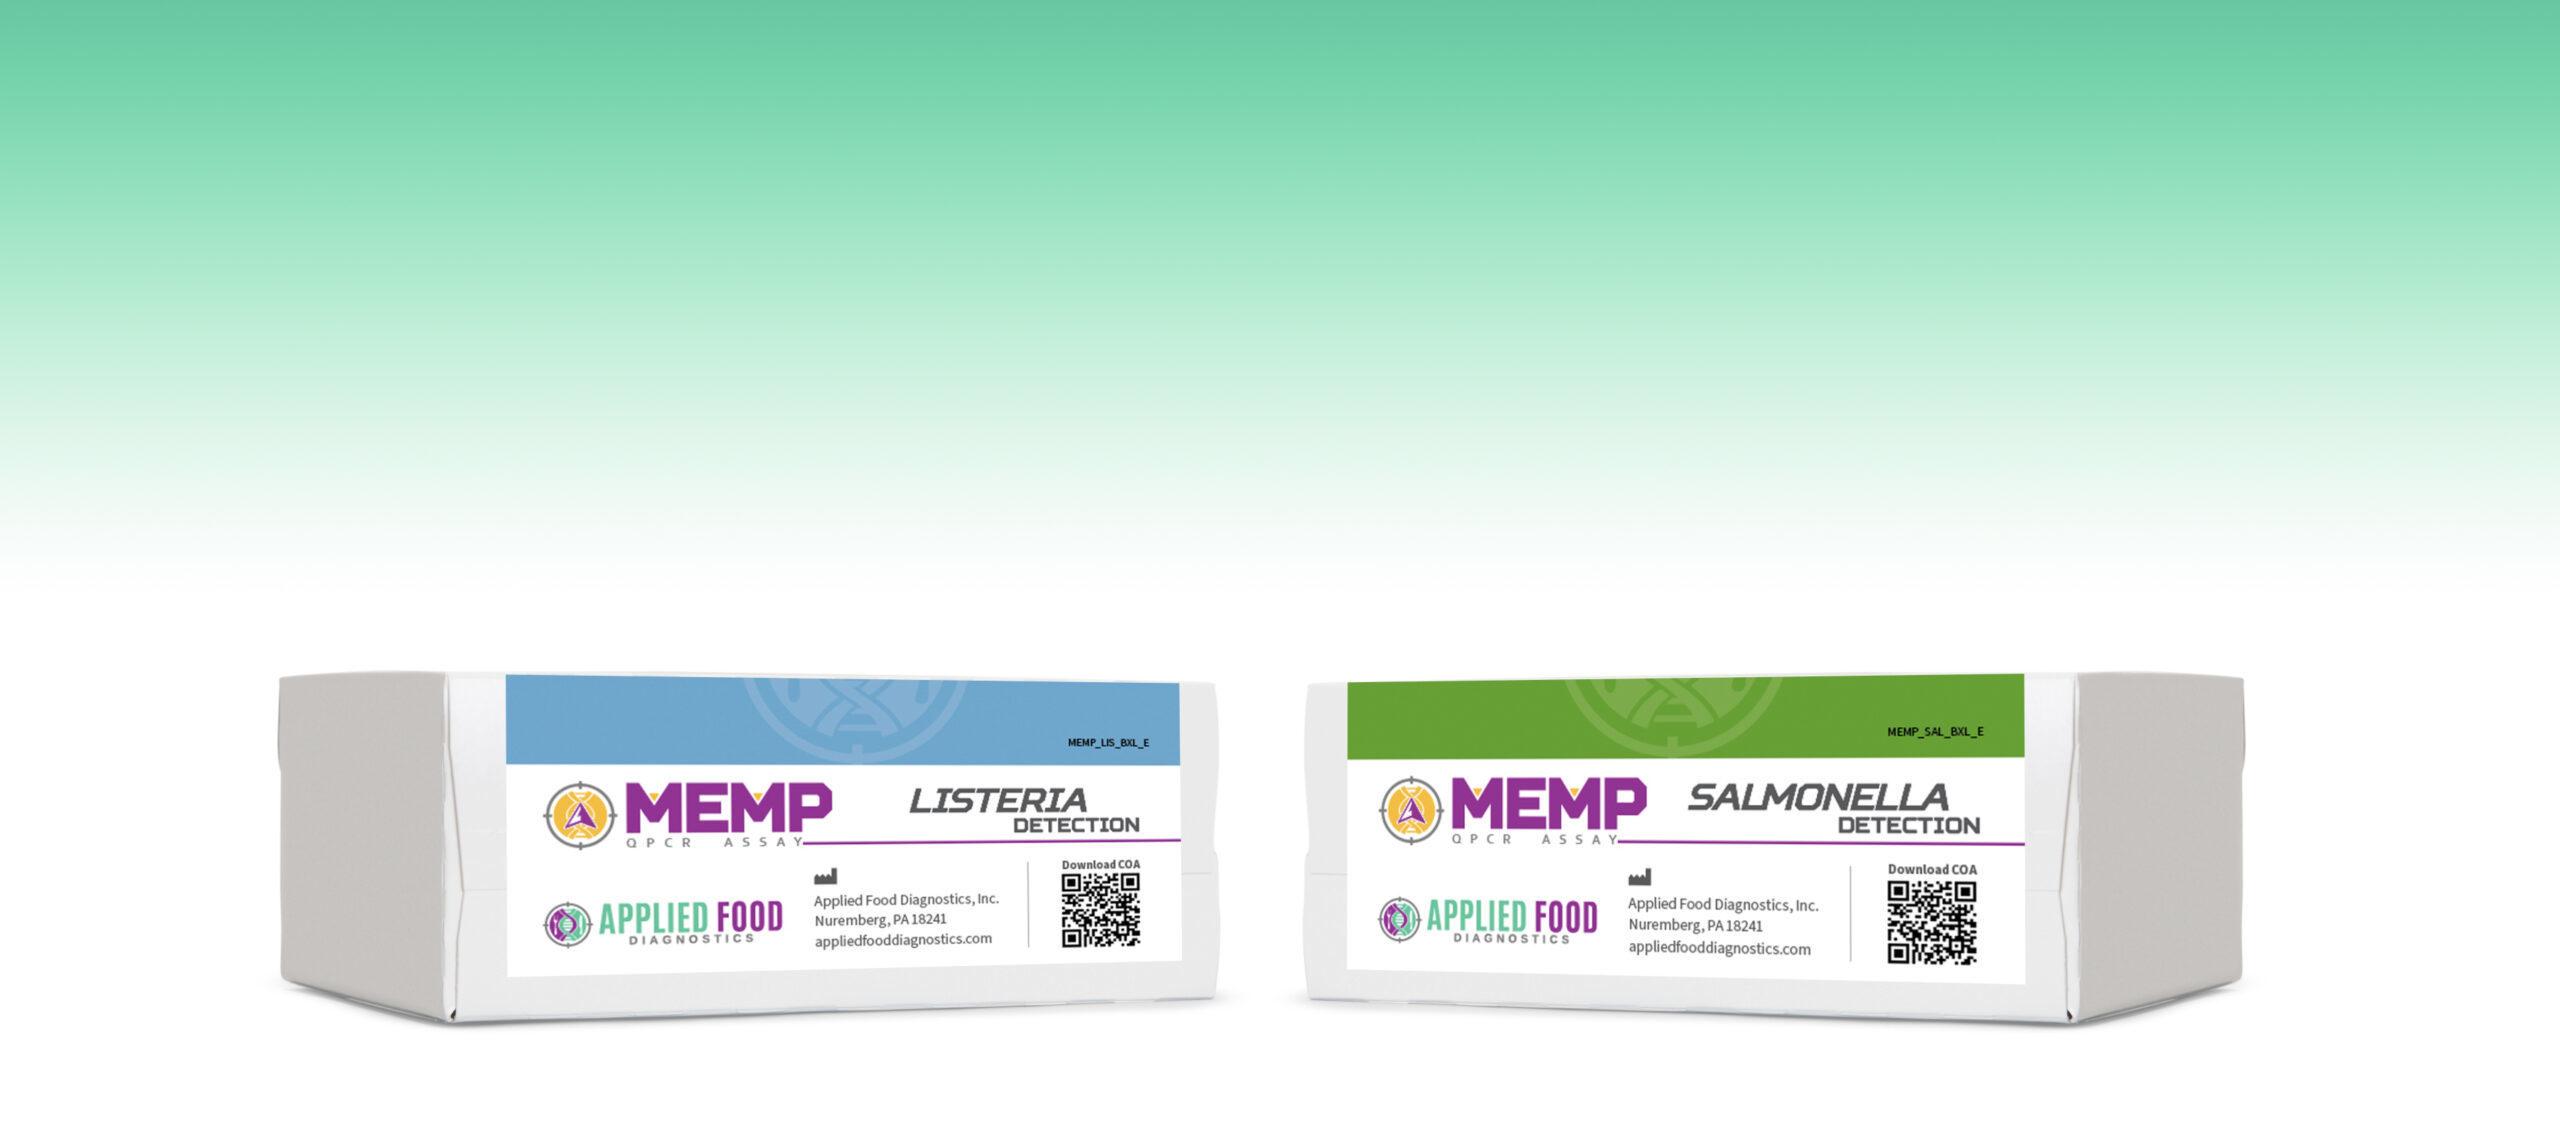 Two MEMP Kits on display